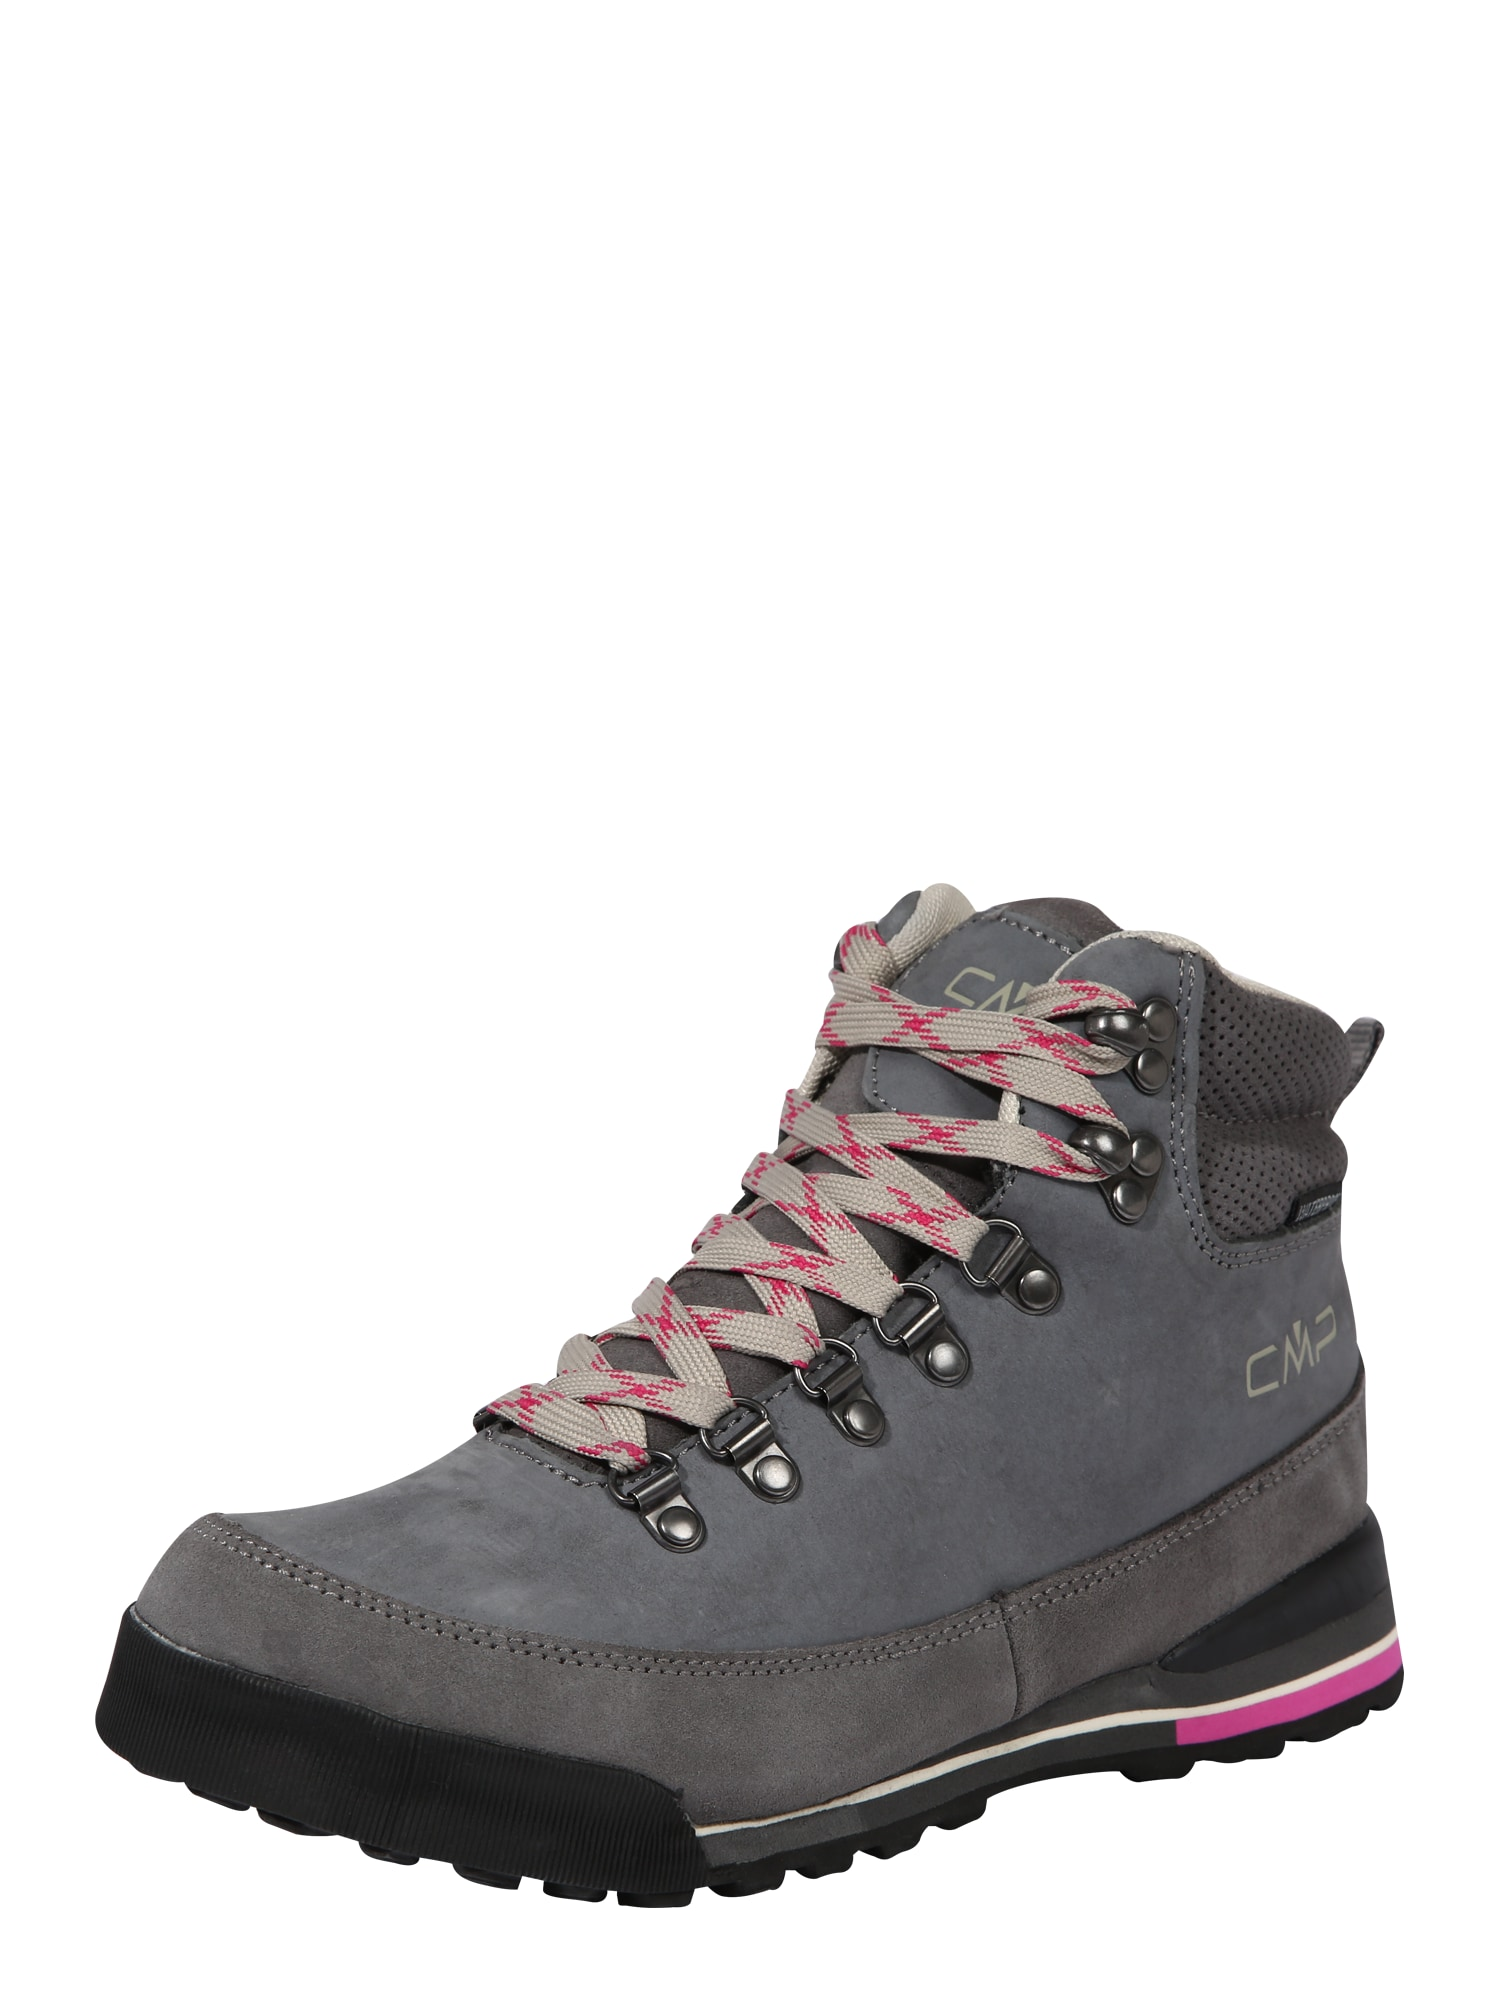 Hikingboots 'HEKA' | Schuhe > Boots > Sonstige Boots | Dunkelgrau - Rosa | CMP